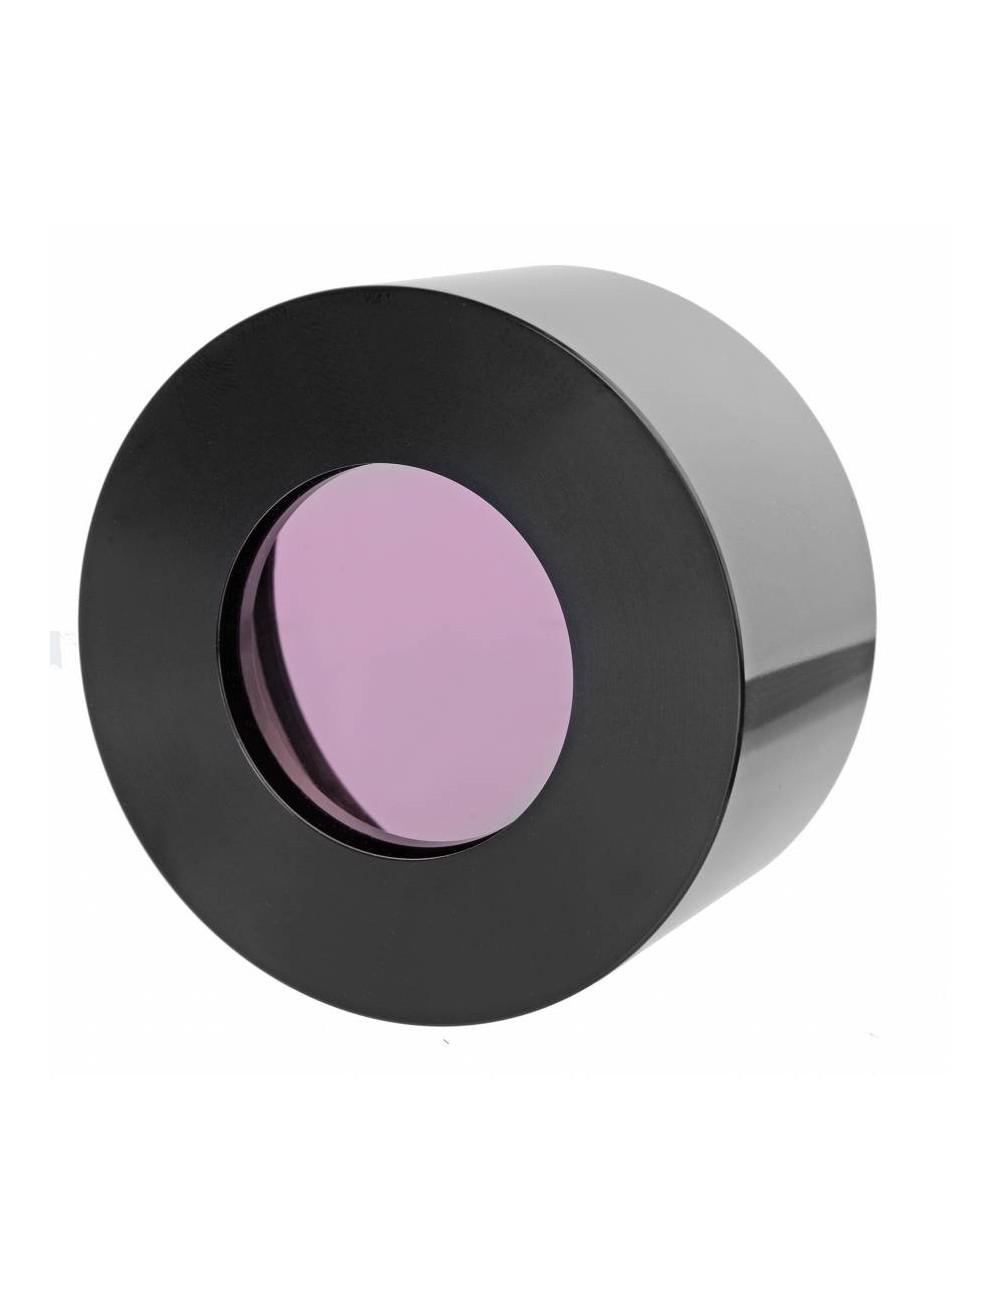 Filtre anti-reflexion pour Lunt LS100THa/DSII